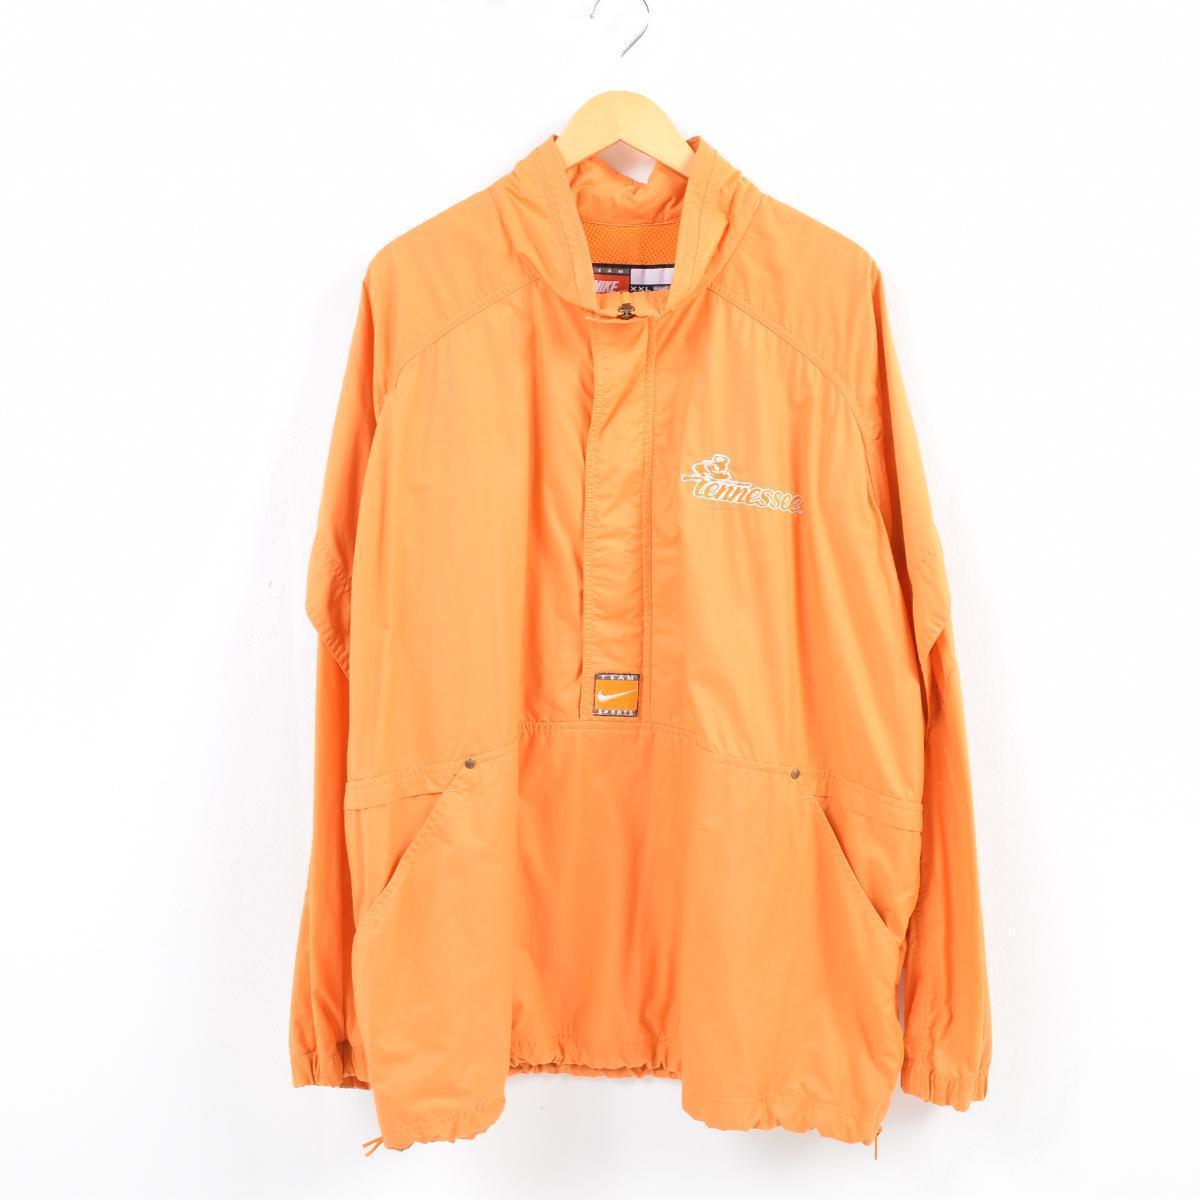 76a1089cef VINTAGE CLOTHING JAM  Nike NIKE TEAM half zip nylon pullover men XXL ...